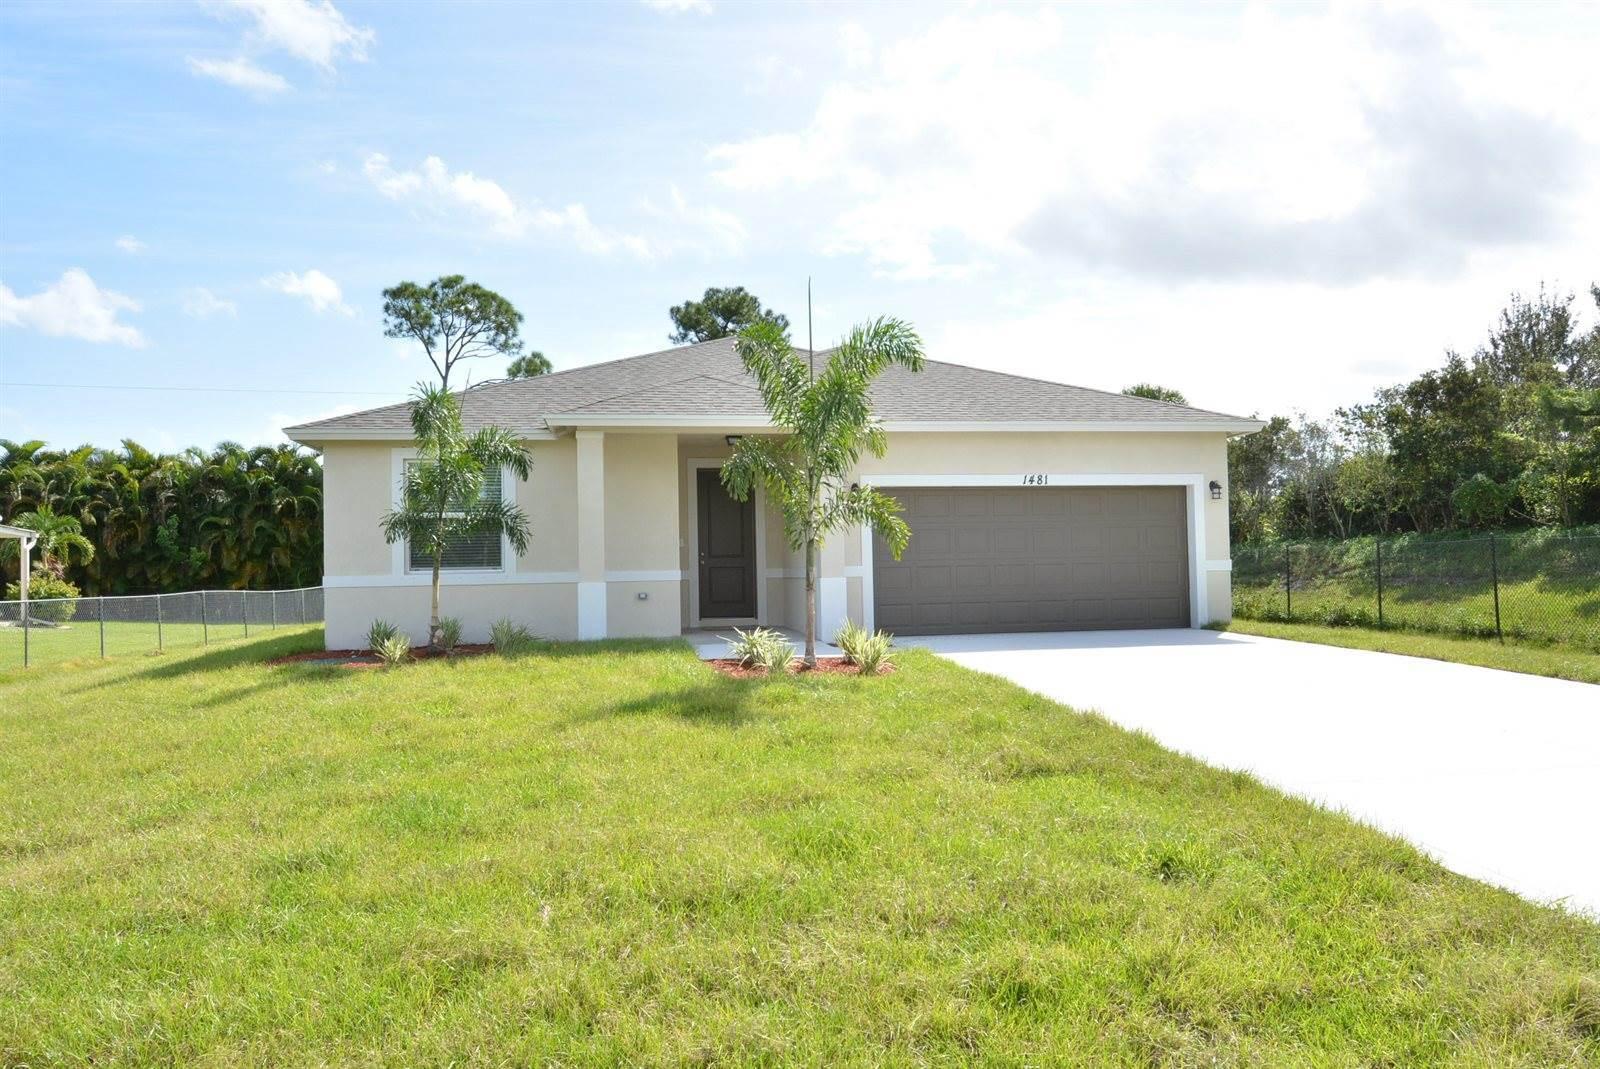 5442 NW Comer Street, Port Saint Lucie, FL 34986